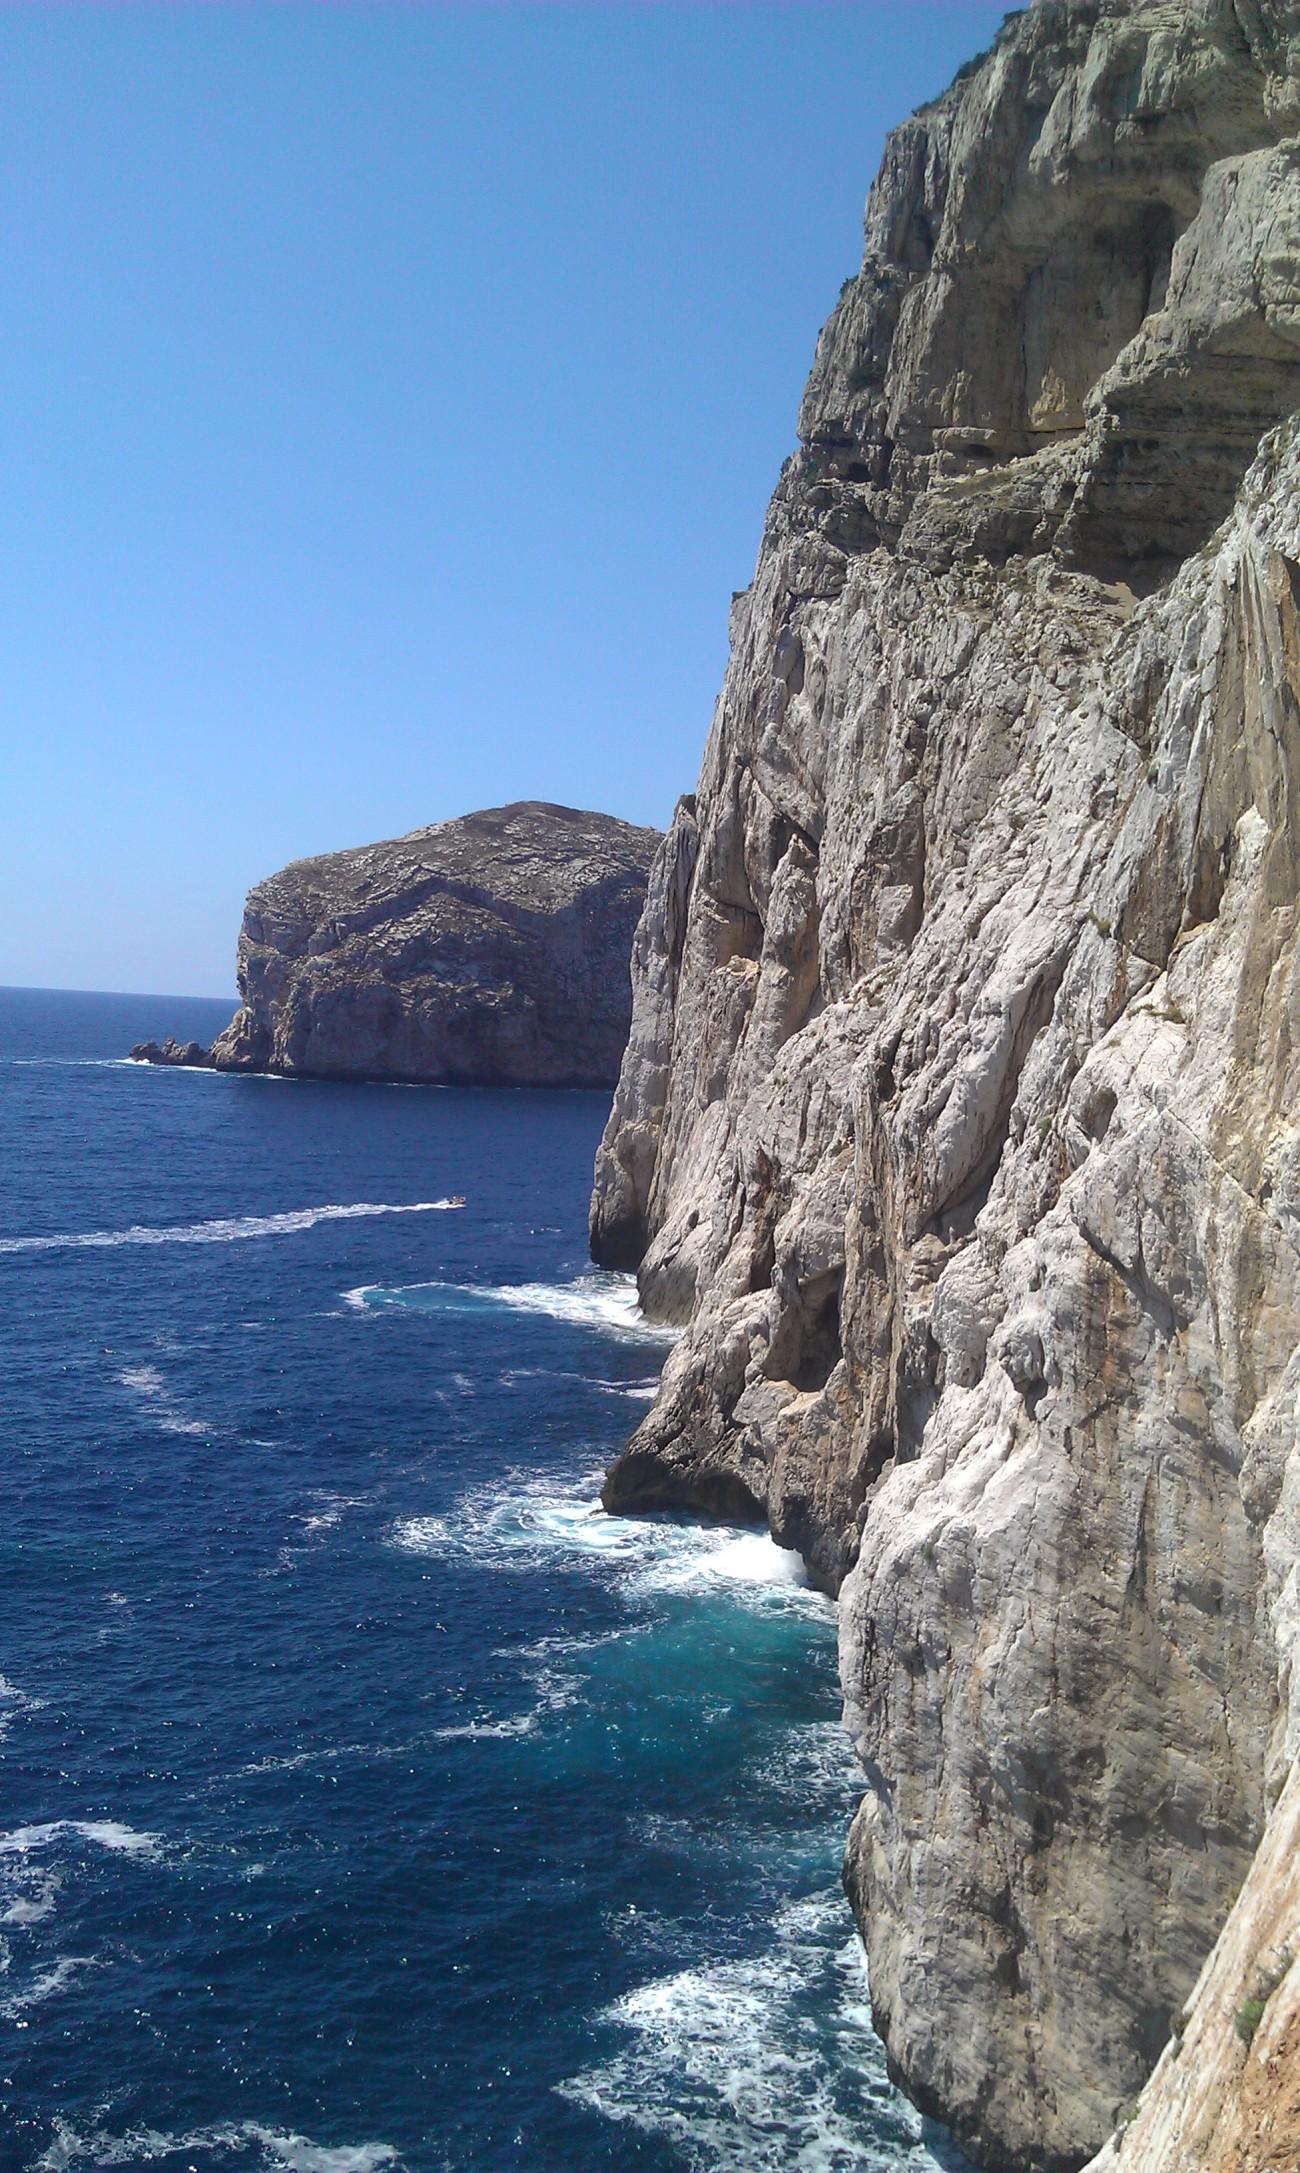 Cliffs to Grotta Nettuno, Alghero, Sardinia